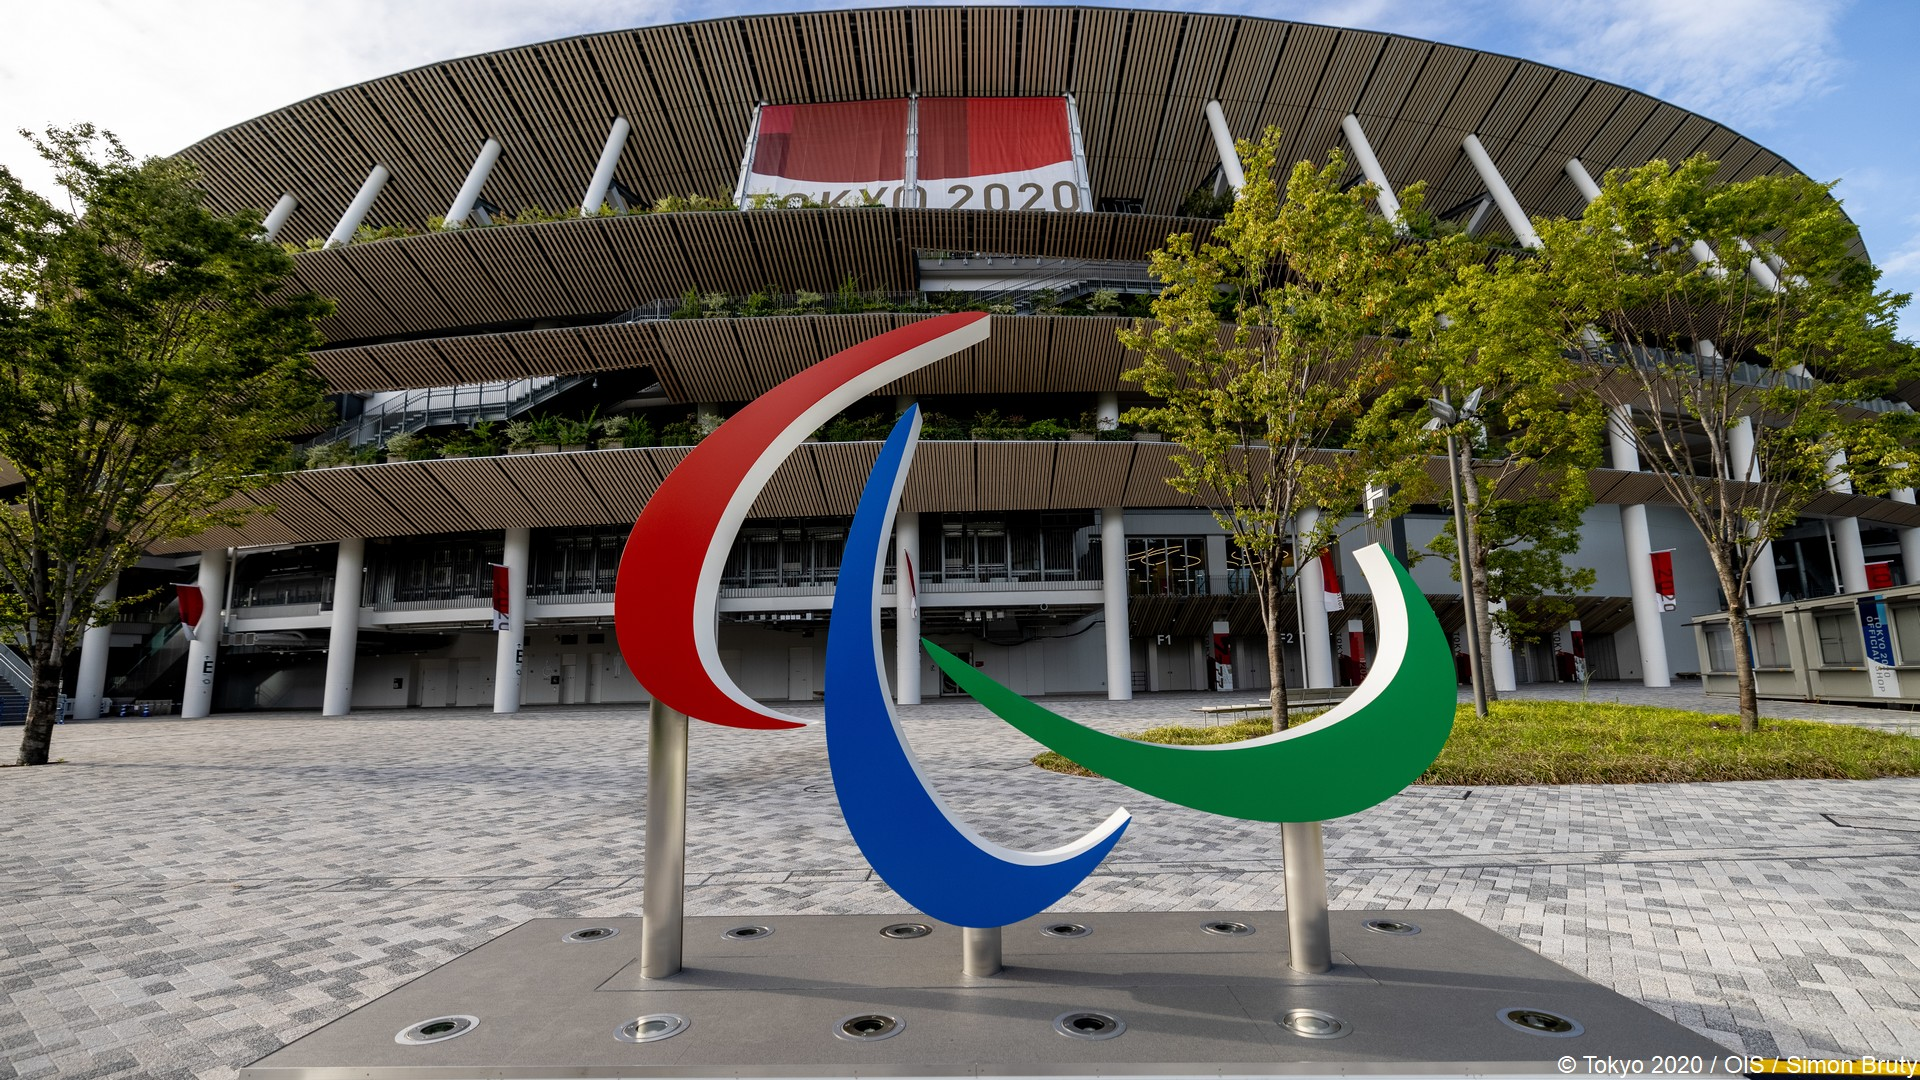 Tokyo 2020 – Paralympiques (2)